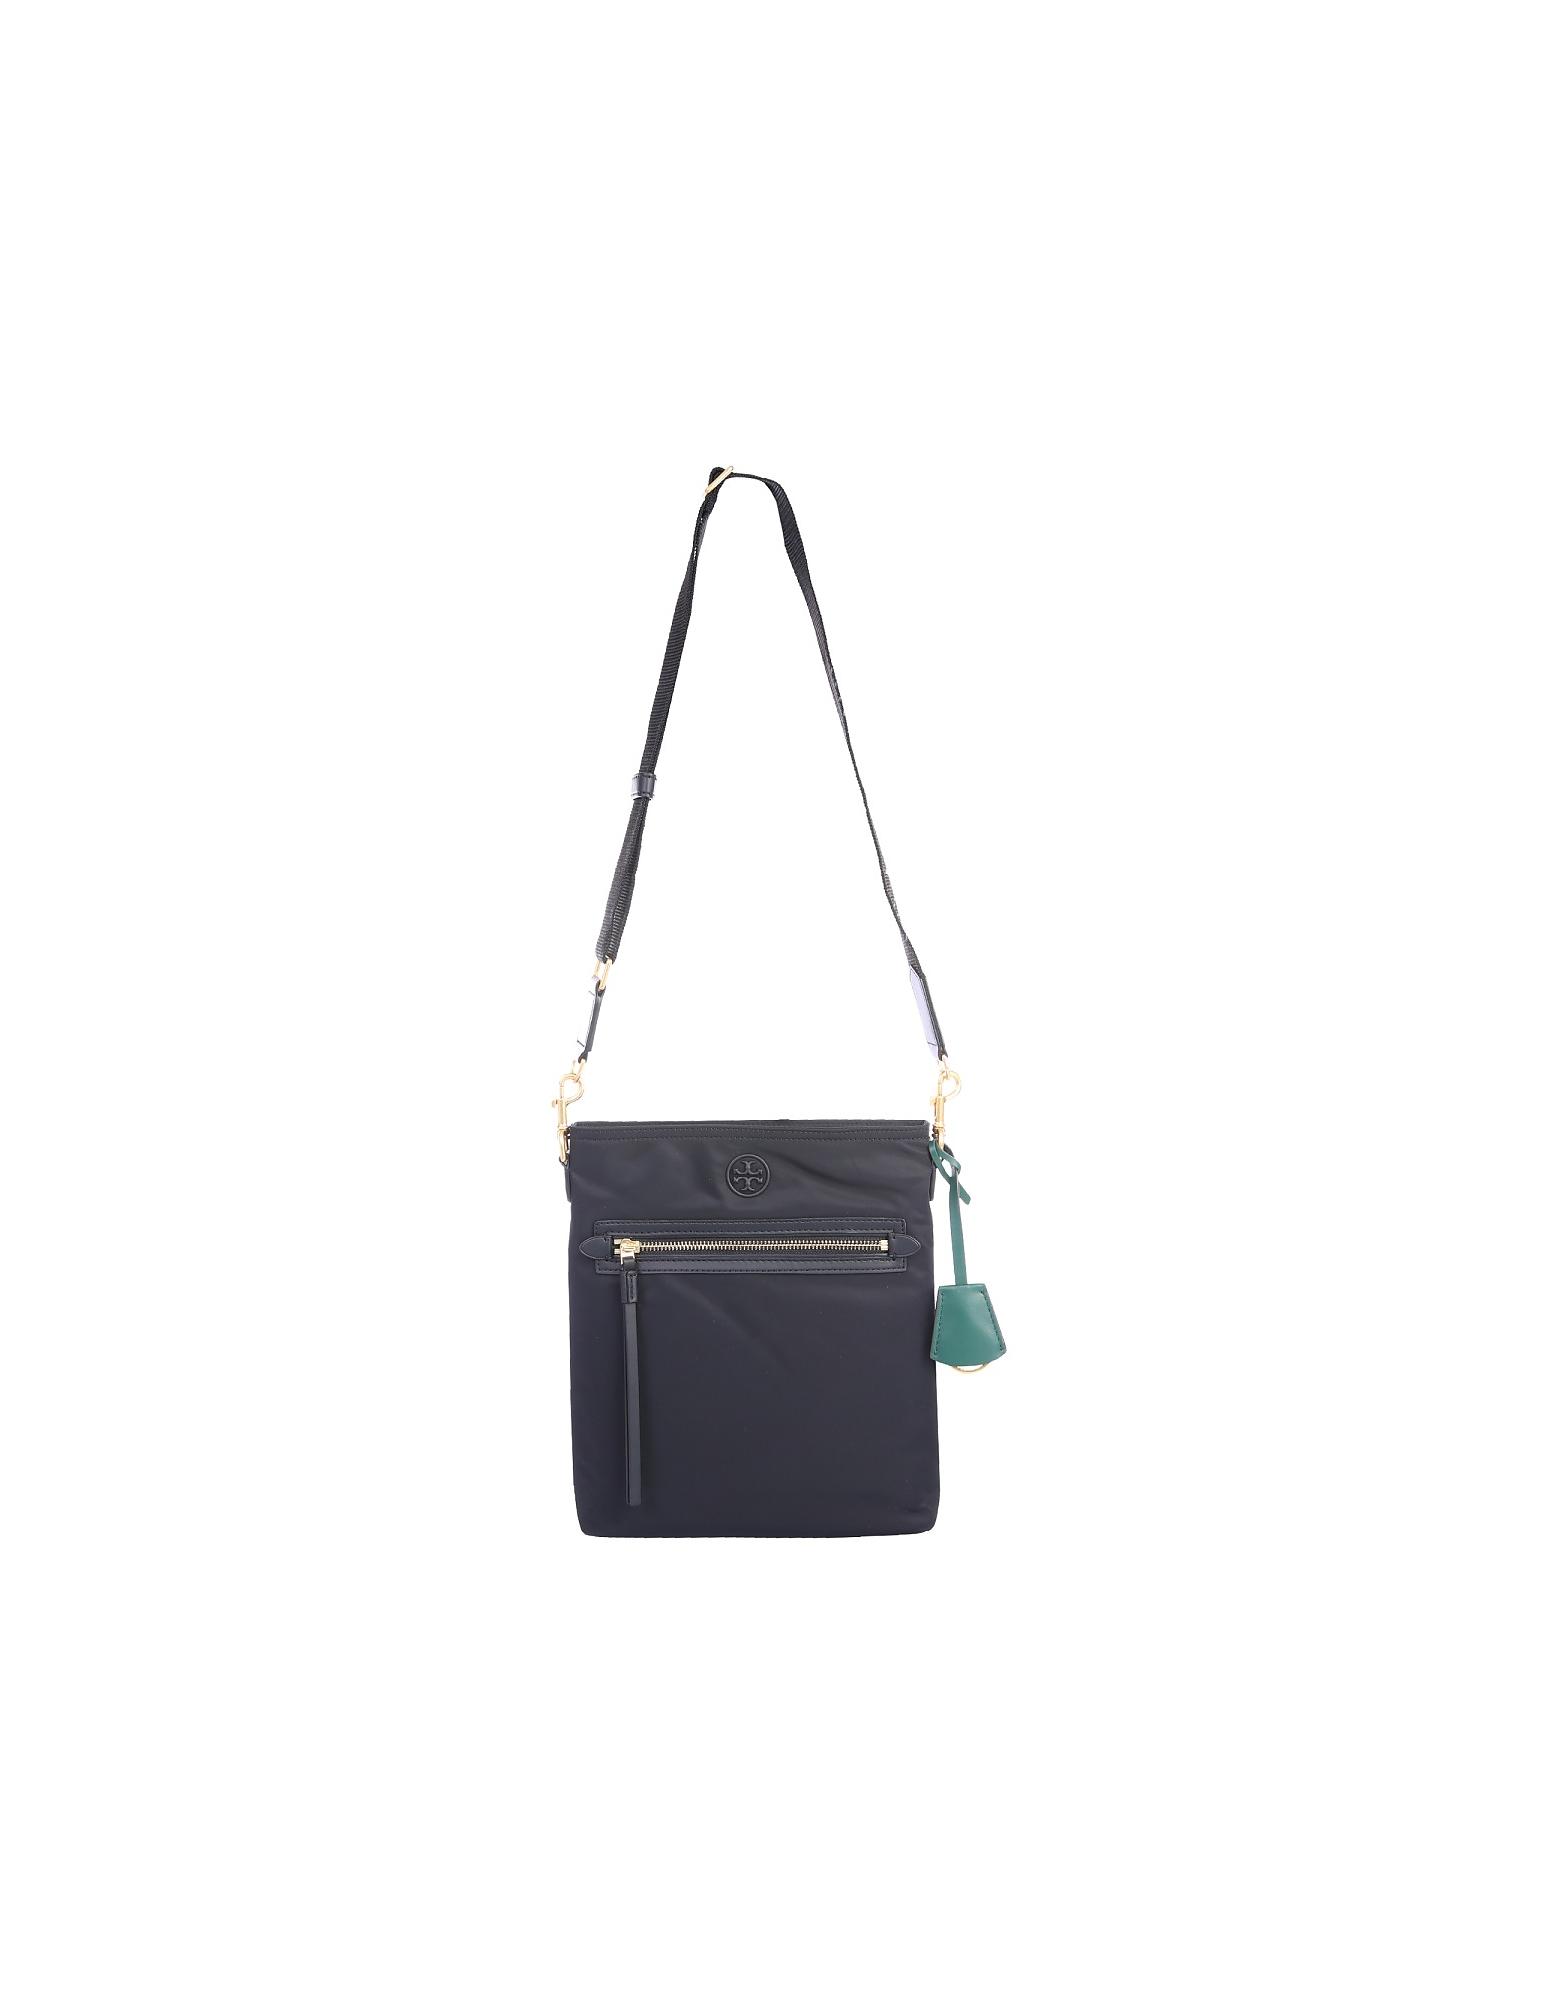 Tory Burch Designer Handbags, Perry Black Nylon Crossbody Bag